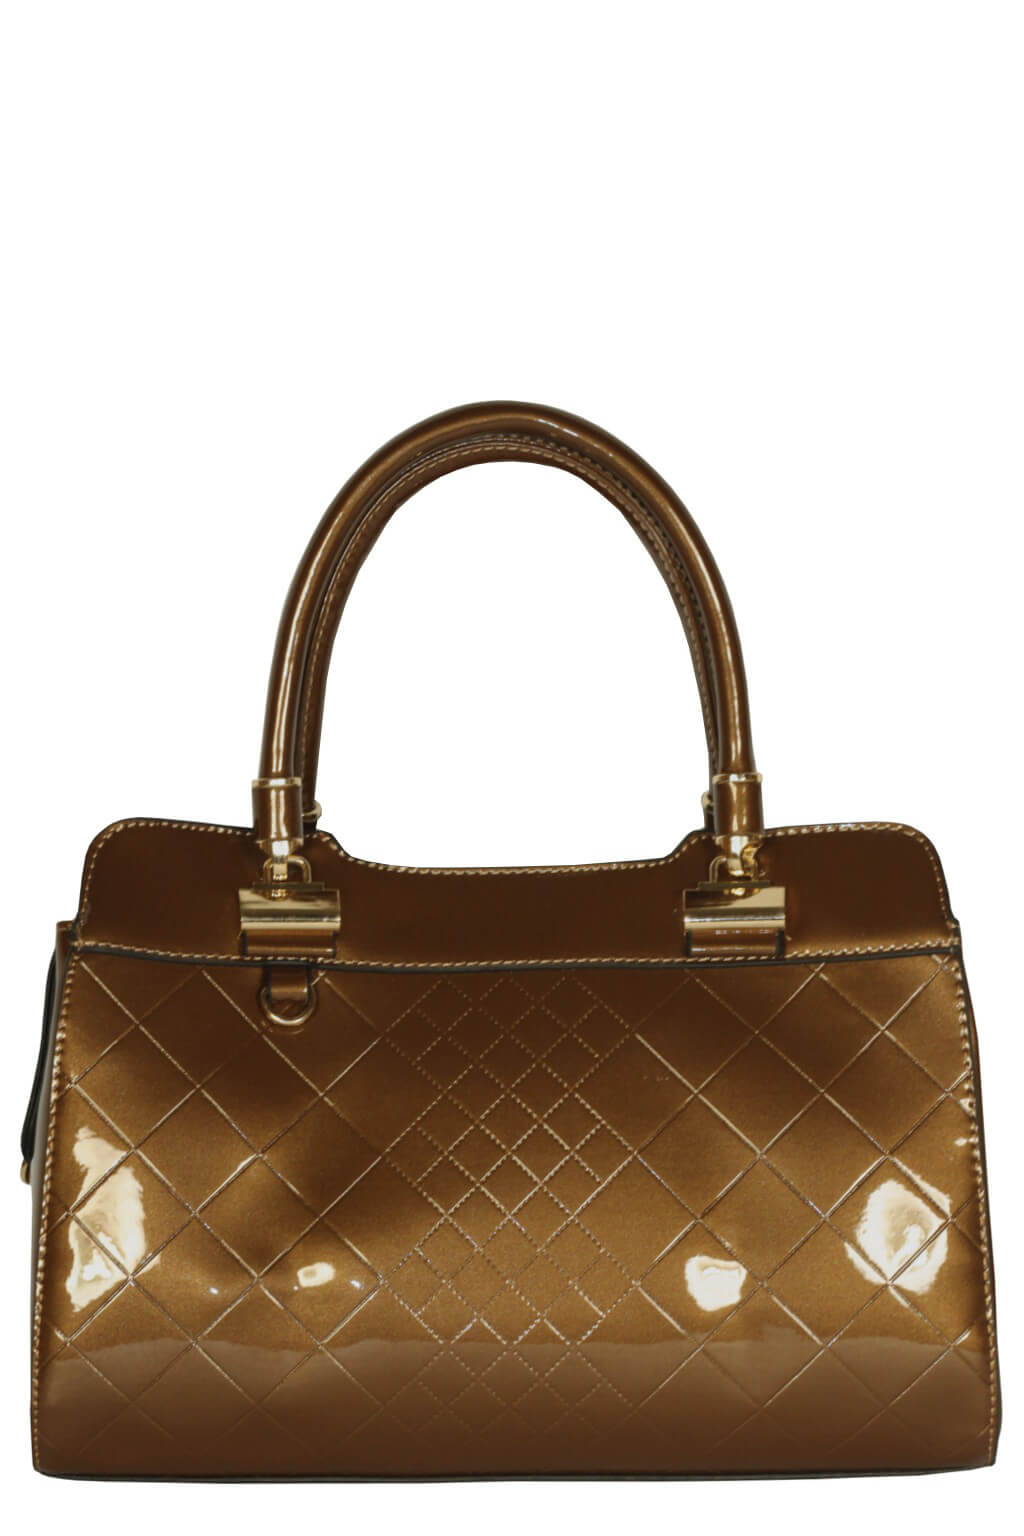 db3f1cf052 Ambrosine Lux dámská kabelka zlatá